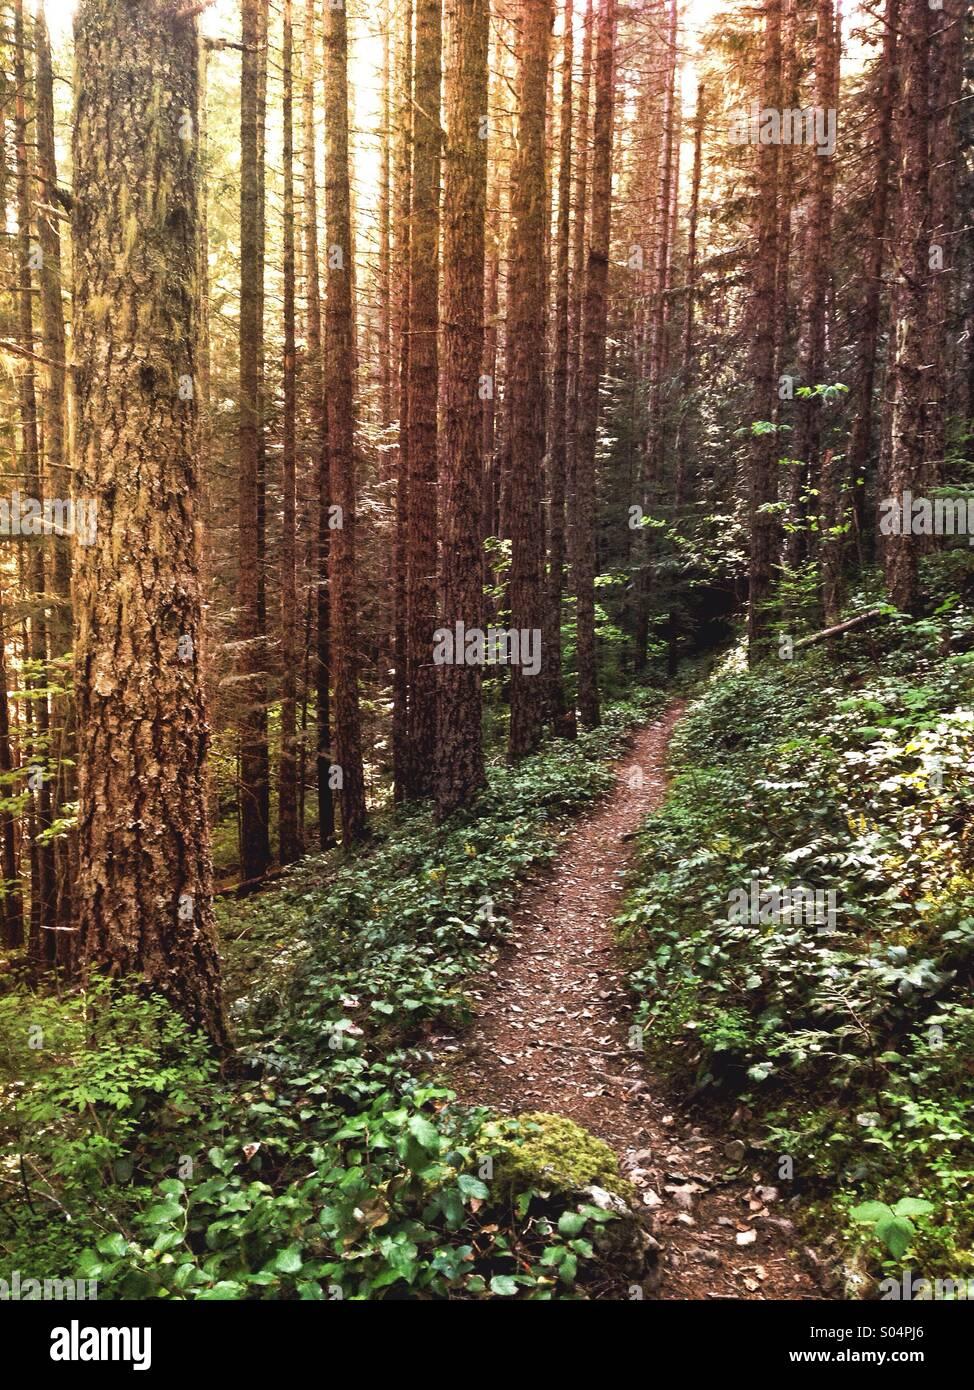 Excelsior Peak Trail, Whatcom County, WA - Stock Image